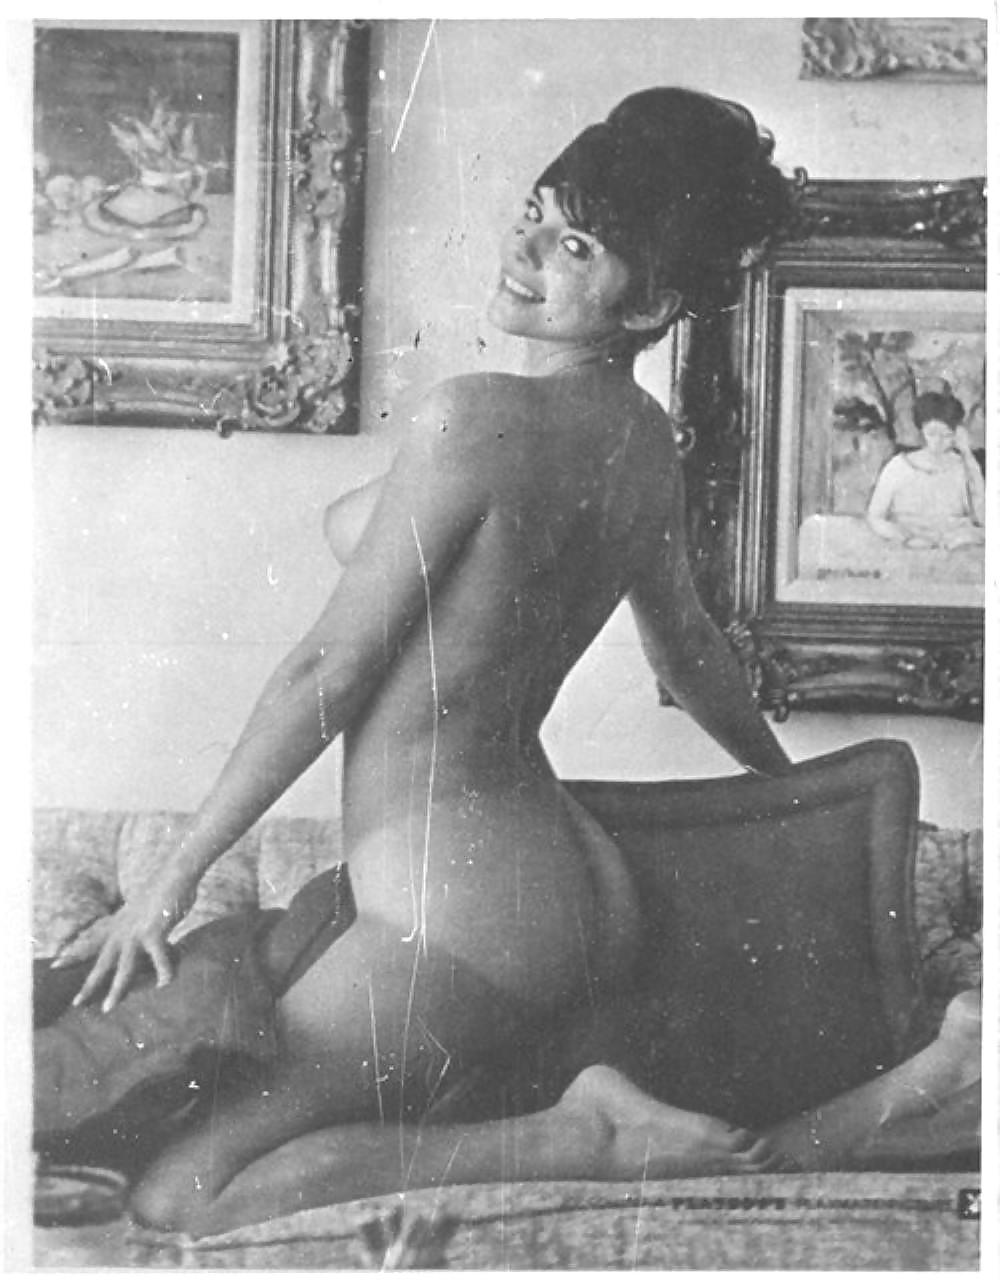 Claudia cardinale nude pics, page